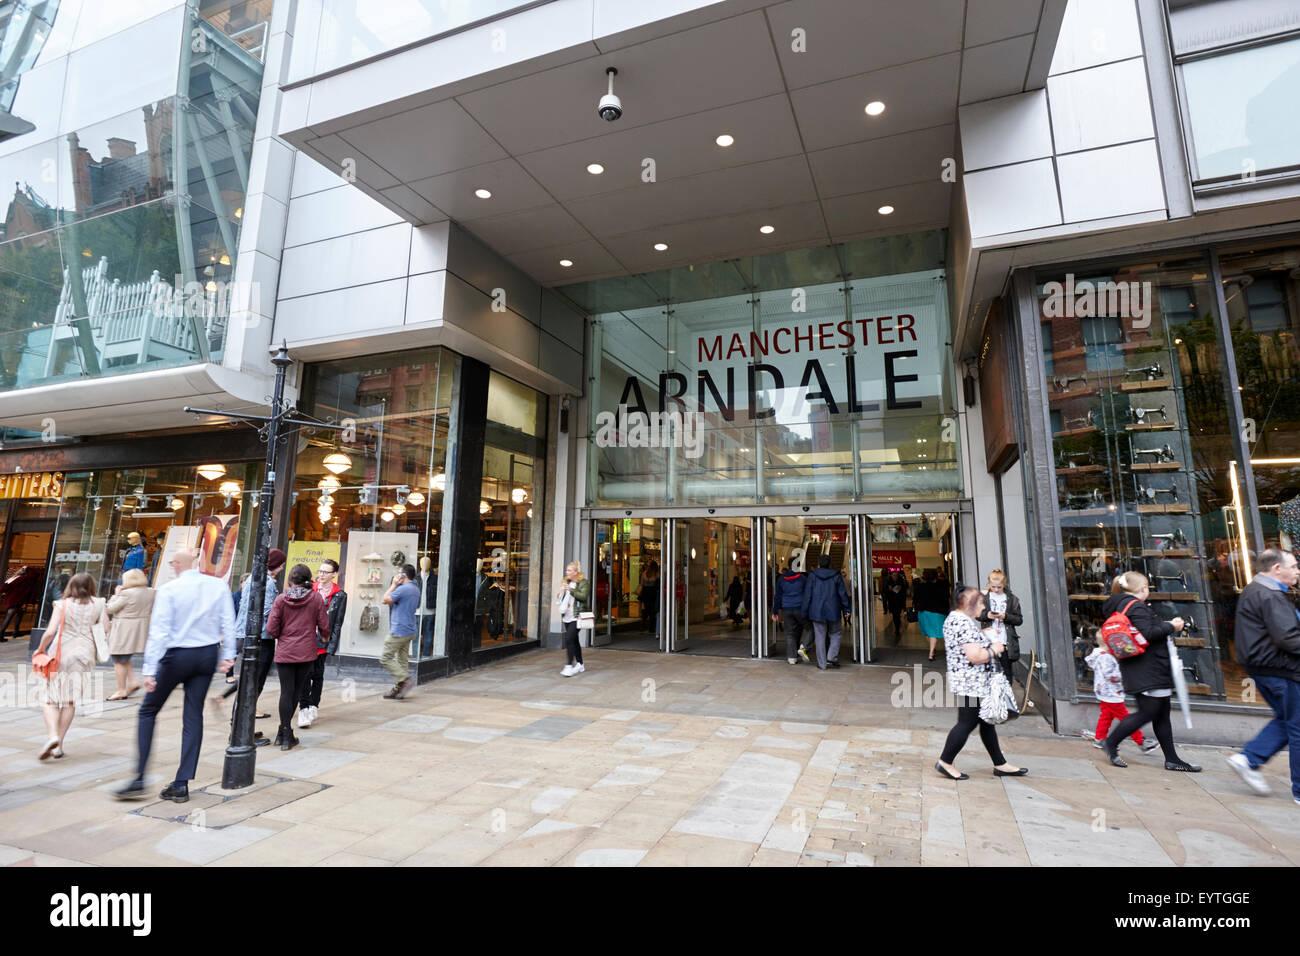 The arndale shopping centre Manchester England UK - Stock Image